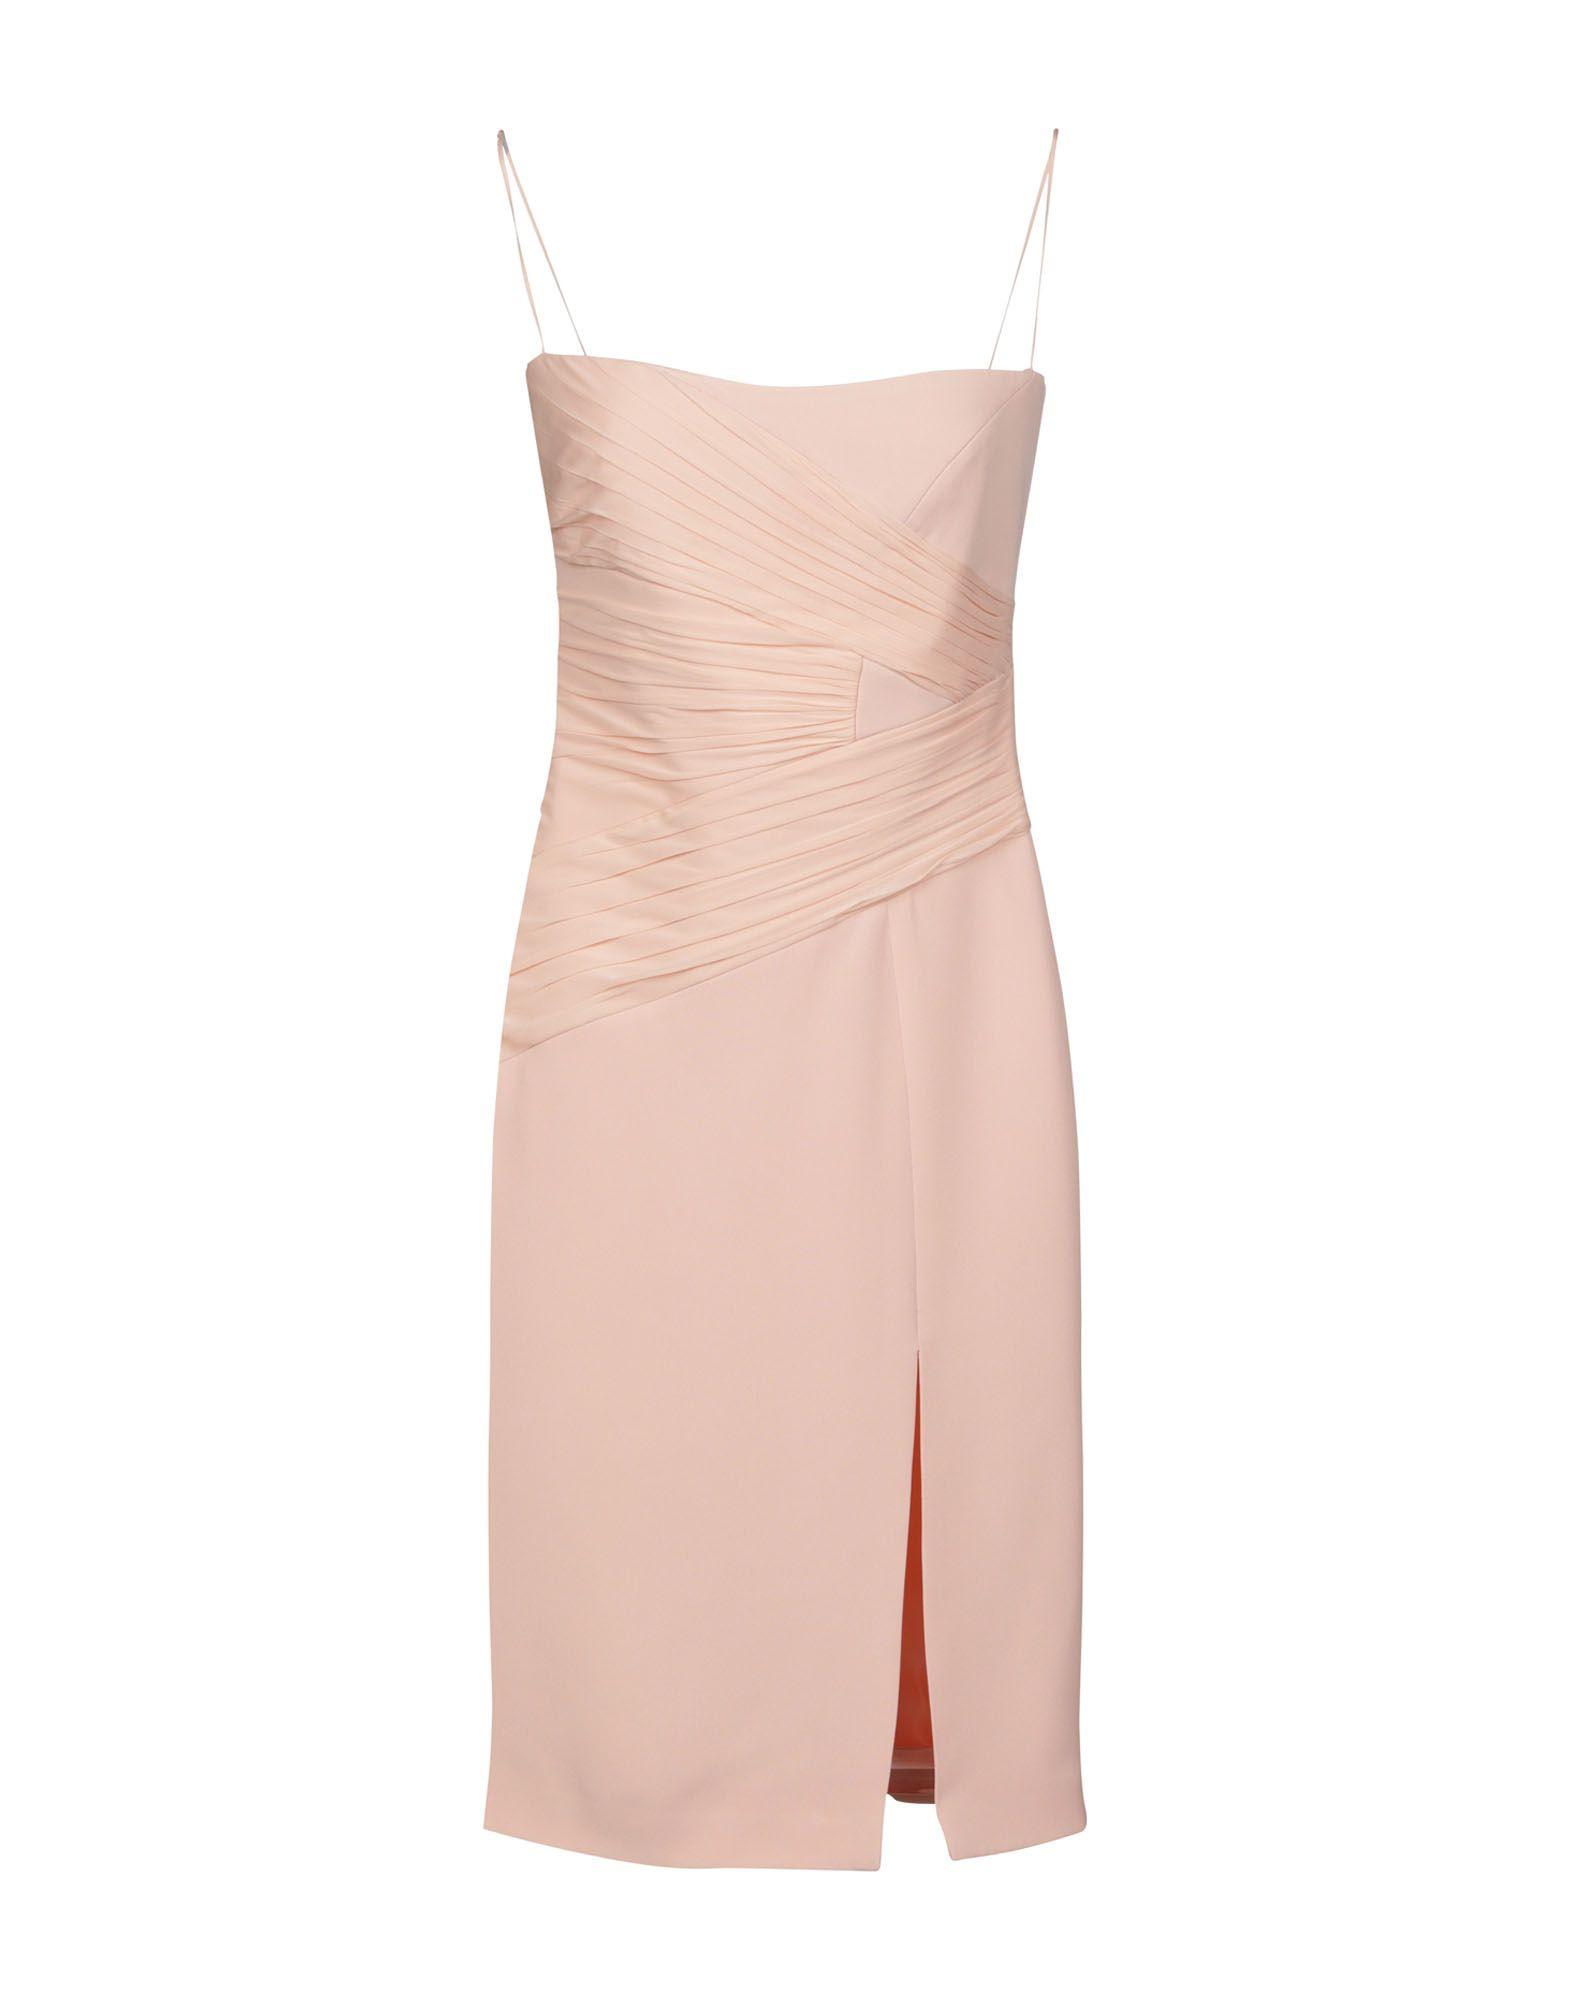 15 Cool Abendkleid Yoox Stylish Perfekt Abendkleid Yoox Vertrieb